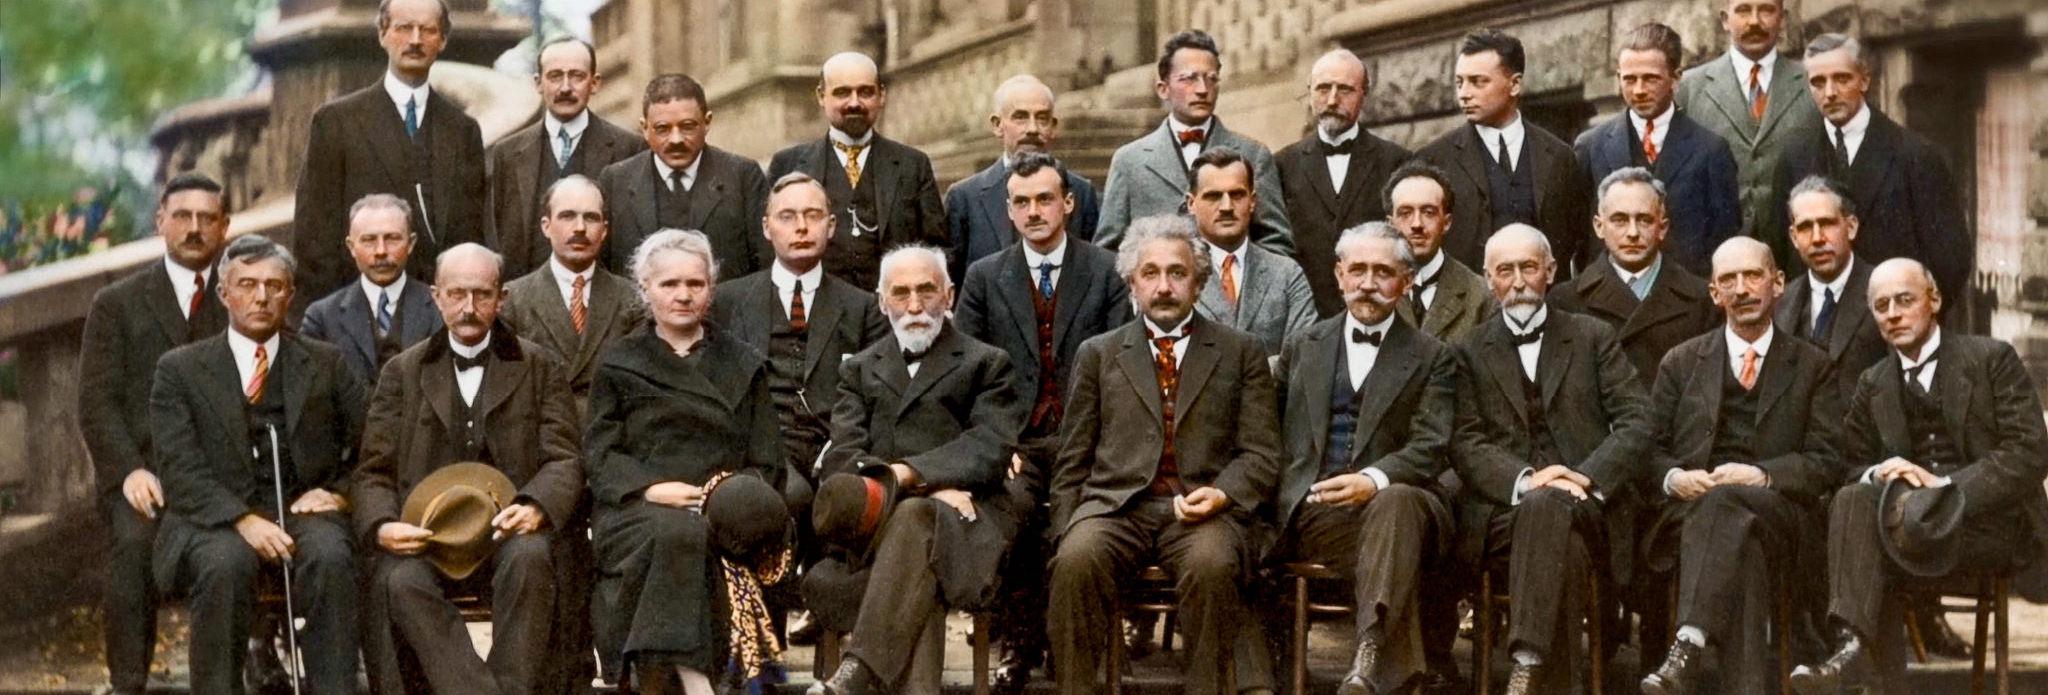 Knabenphysik At 92: Remembering the Boys' Club of Early Quantum Mechanics